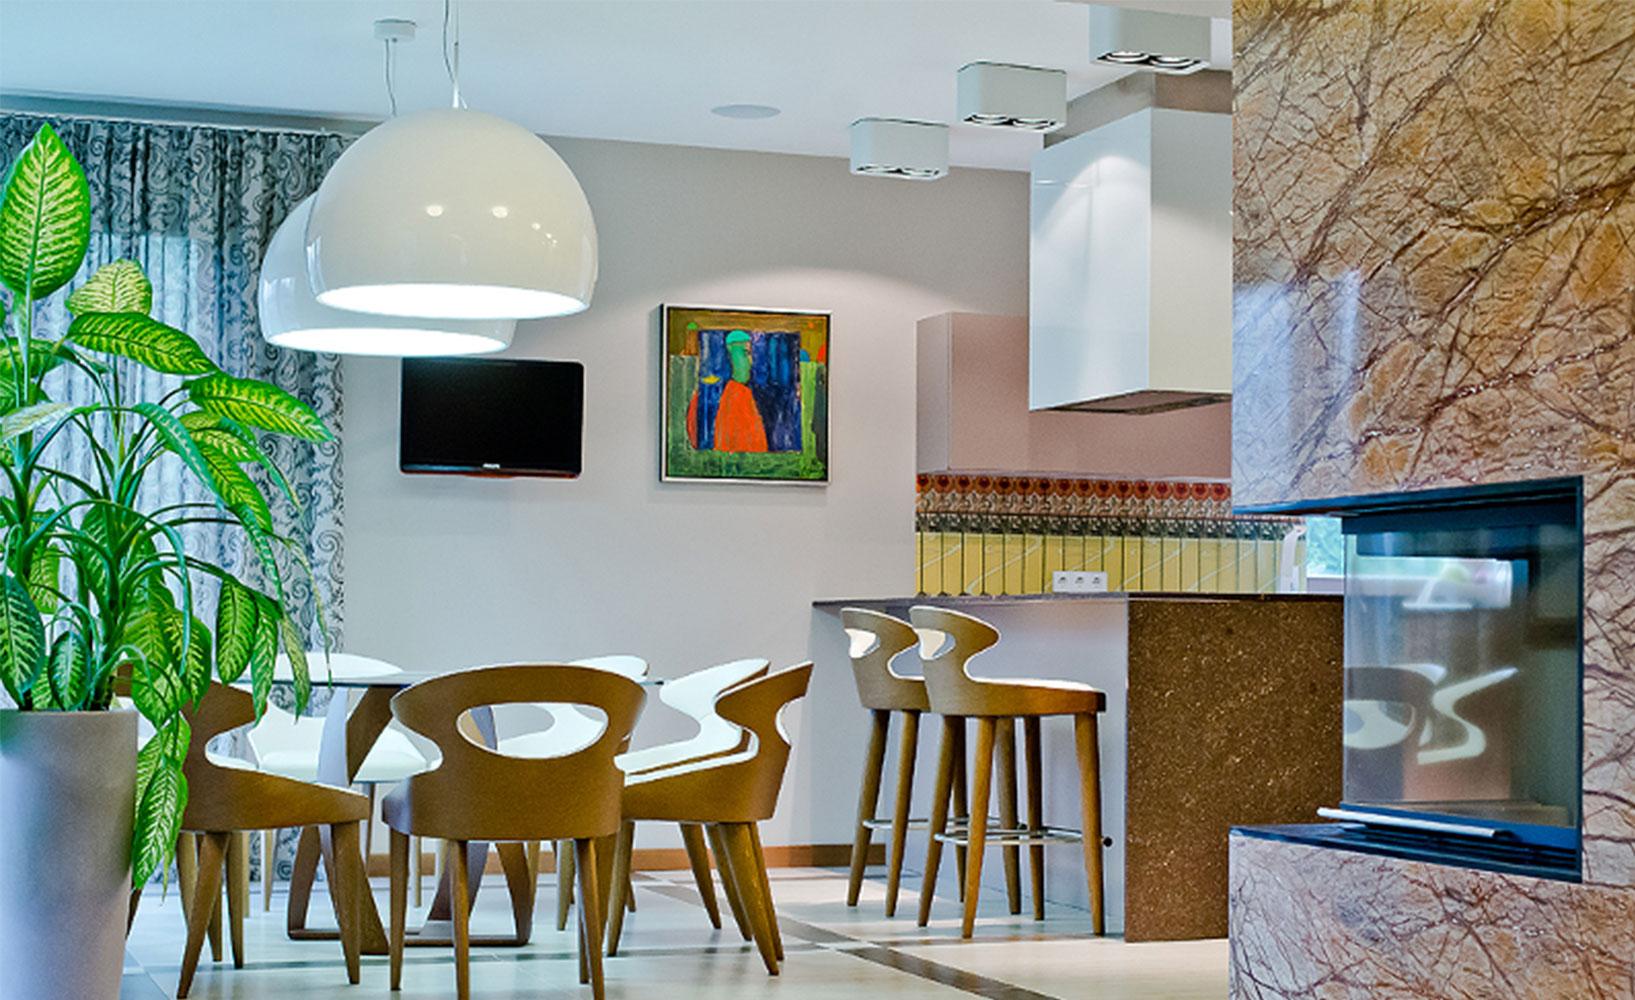 atmosph risch indirekte beleuchtung. Black Bedroom Furniture Sets. Home Design Ideas